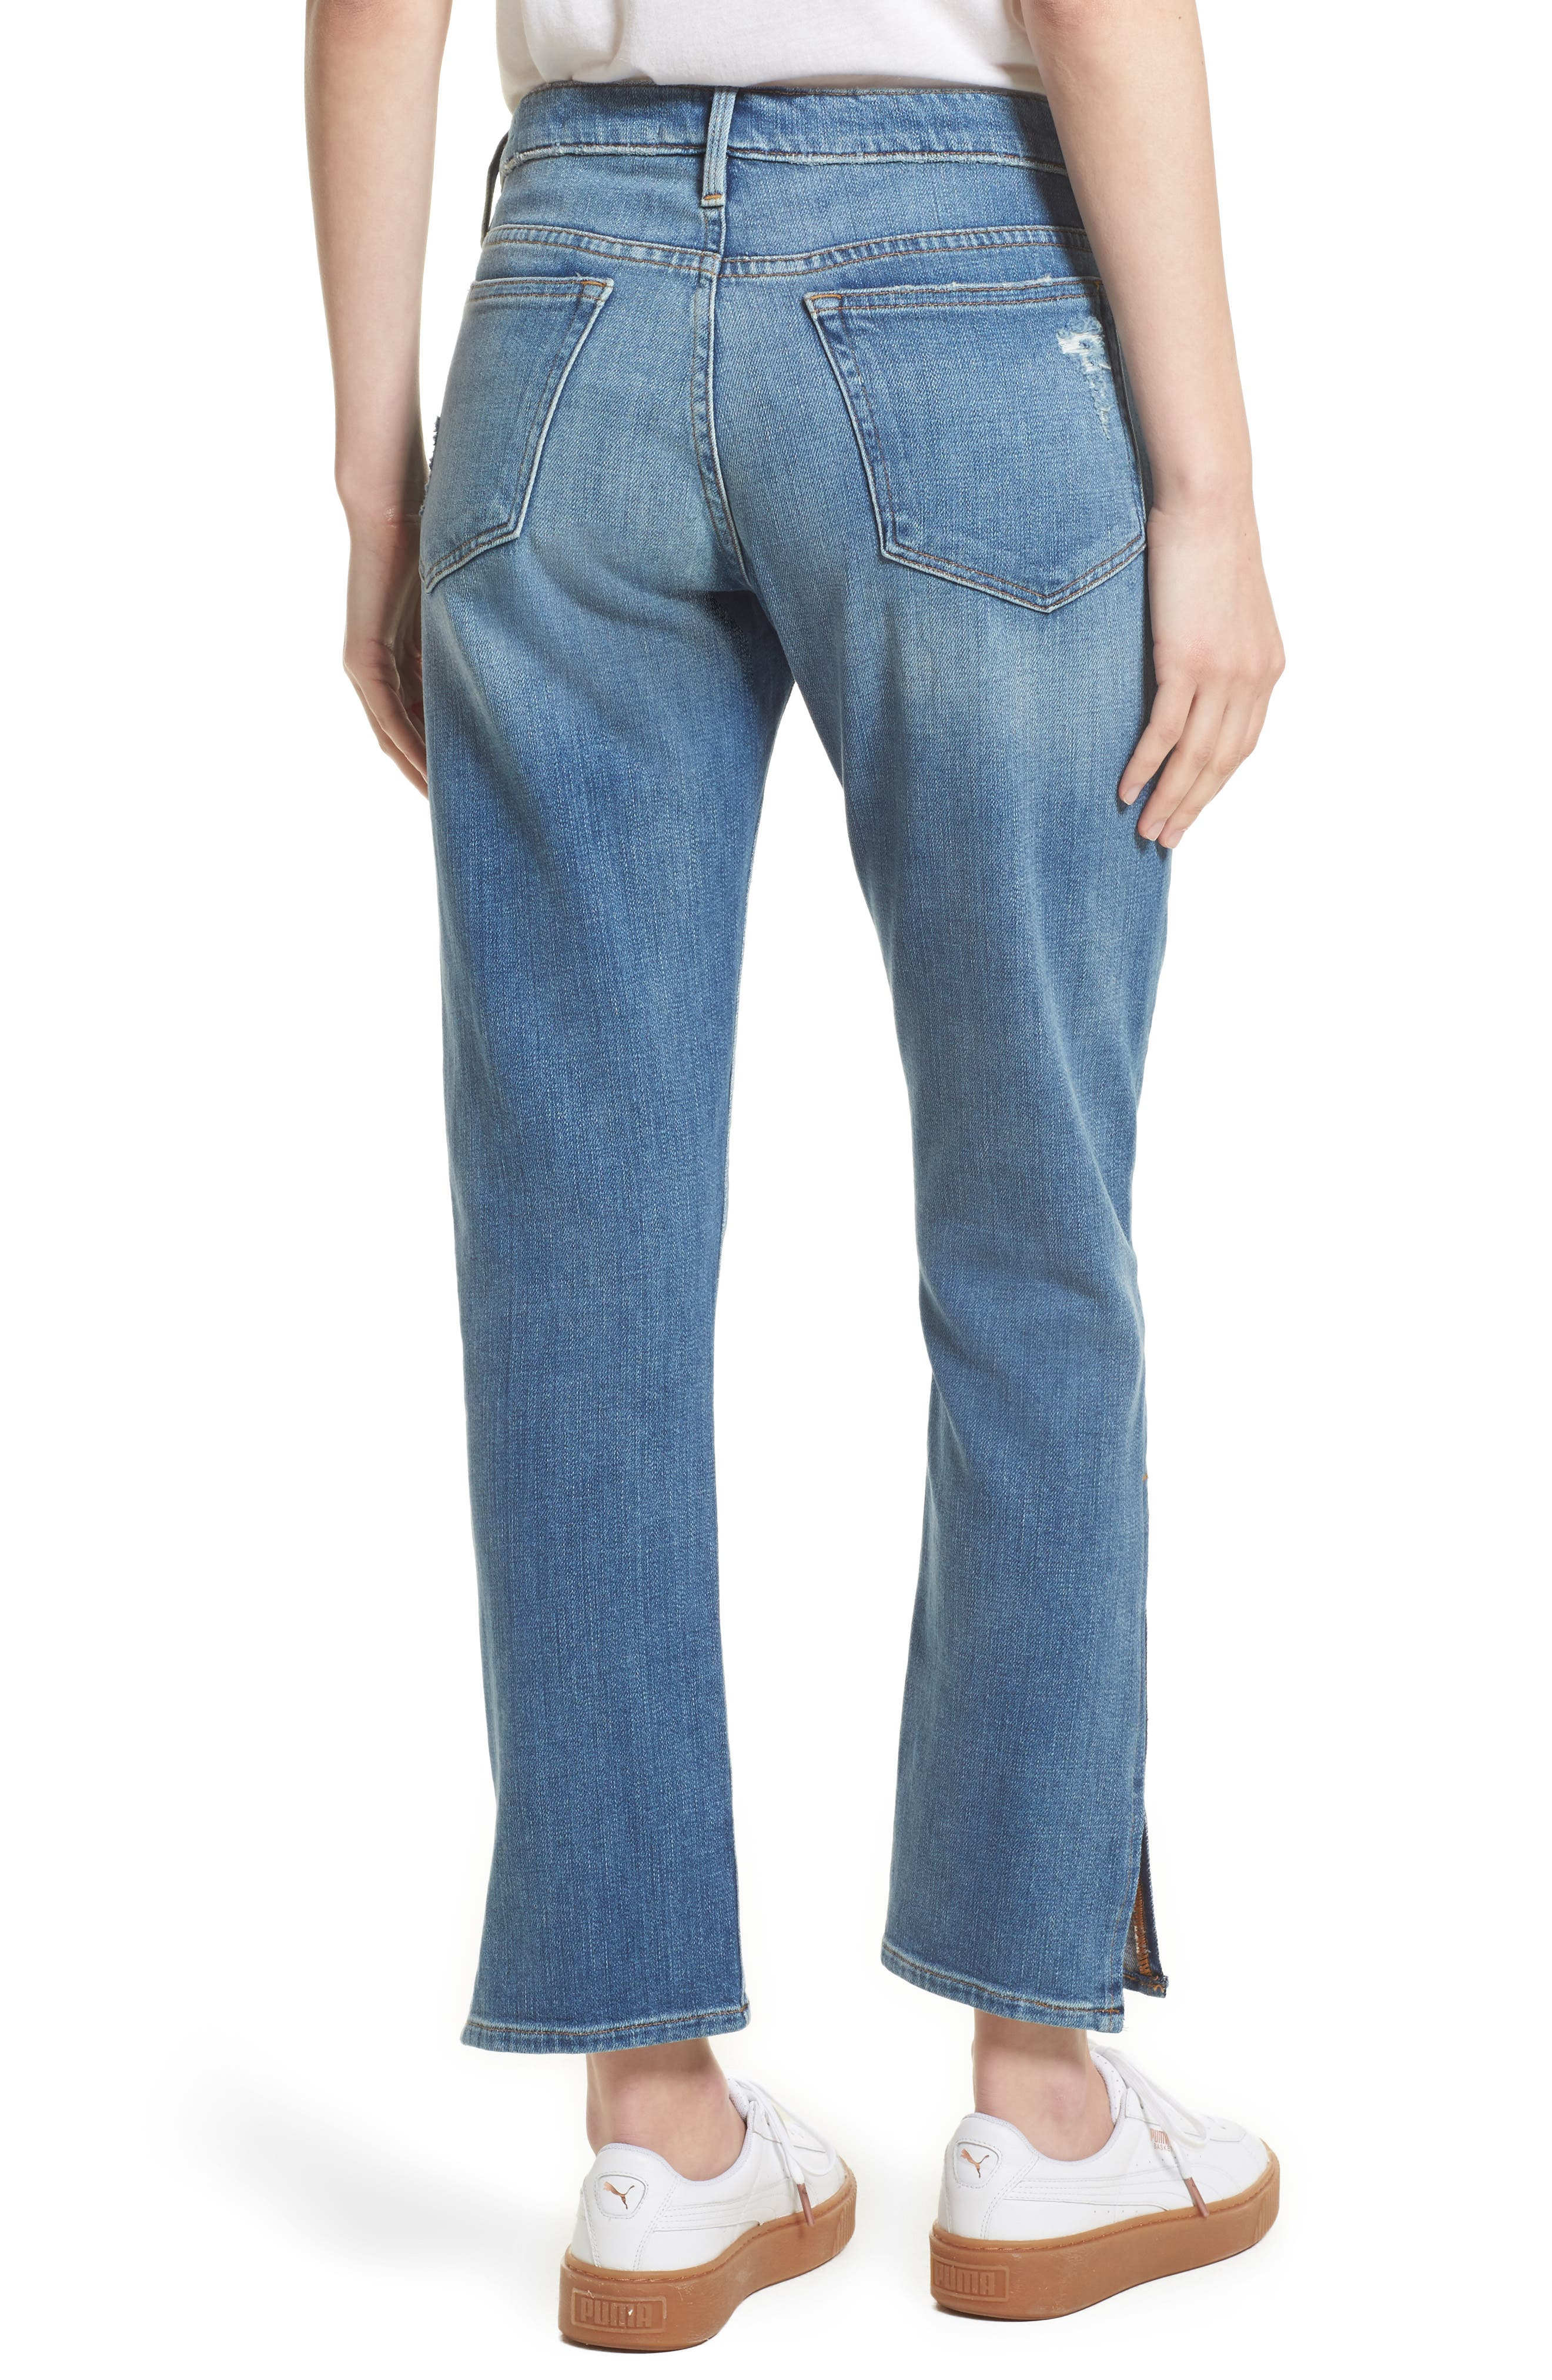 Alternate Image 3  - FRAME Le Boy Zip Hem Crop Jeans (Picadilly) (Nordstrom Exclusive)